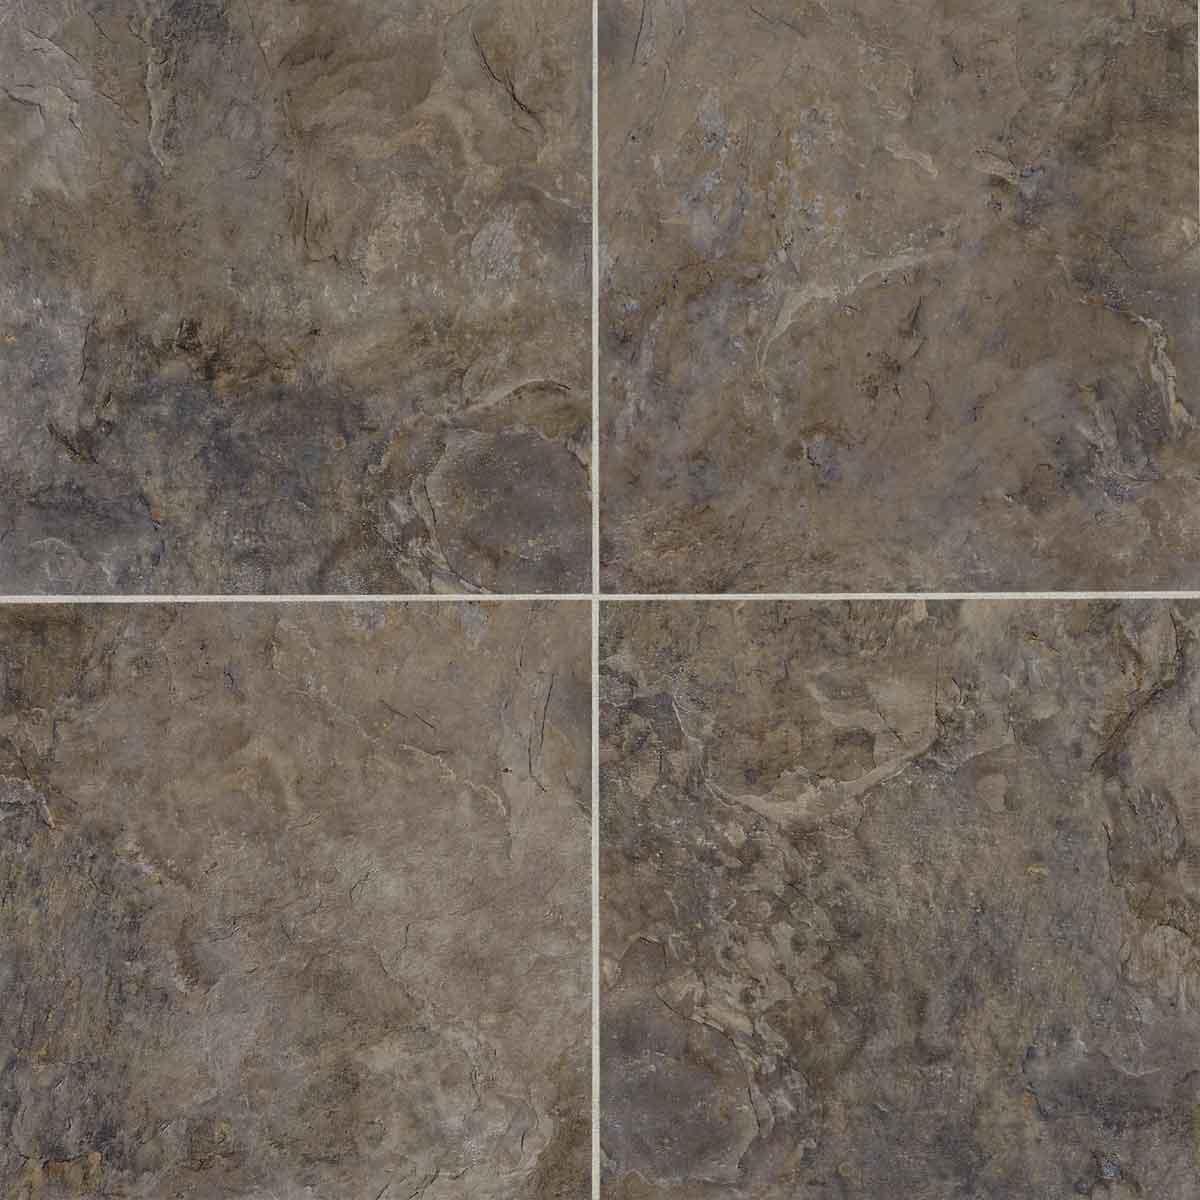 Mannington Vinyl Tile Adura Black Hill At392 16 X 16 Schillings